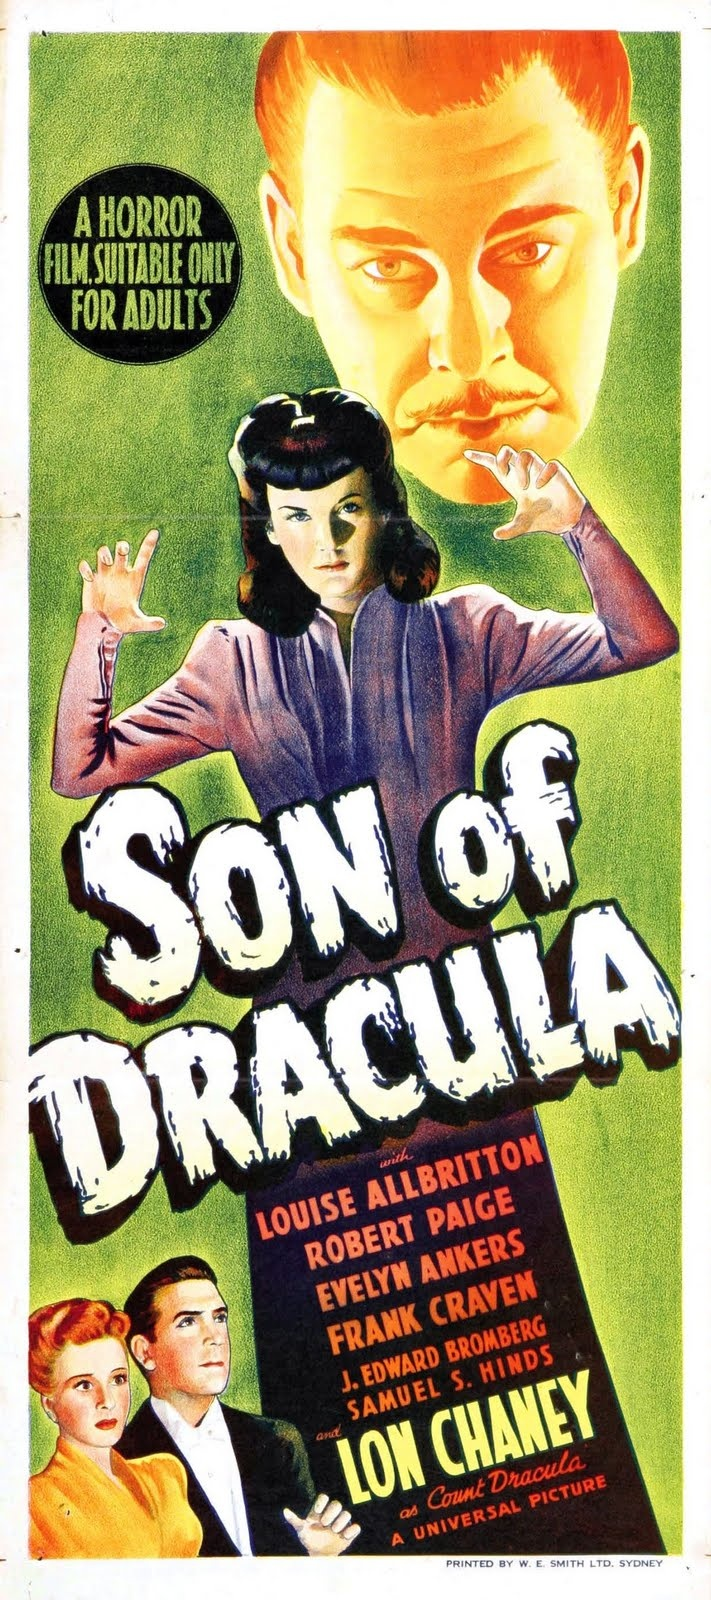 Classic Movie Monsters: B Movies, Evil Divas, Horror Movies, Movies Monsters, Classic Horror, Movies Poster, Monsters Movies, Classic Movies, Dracula Vampires